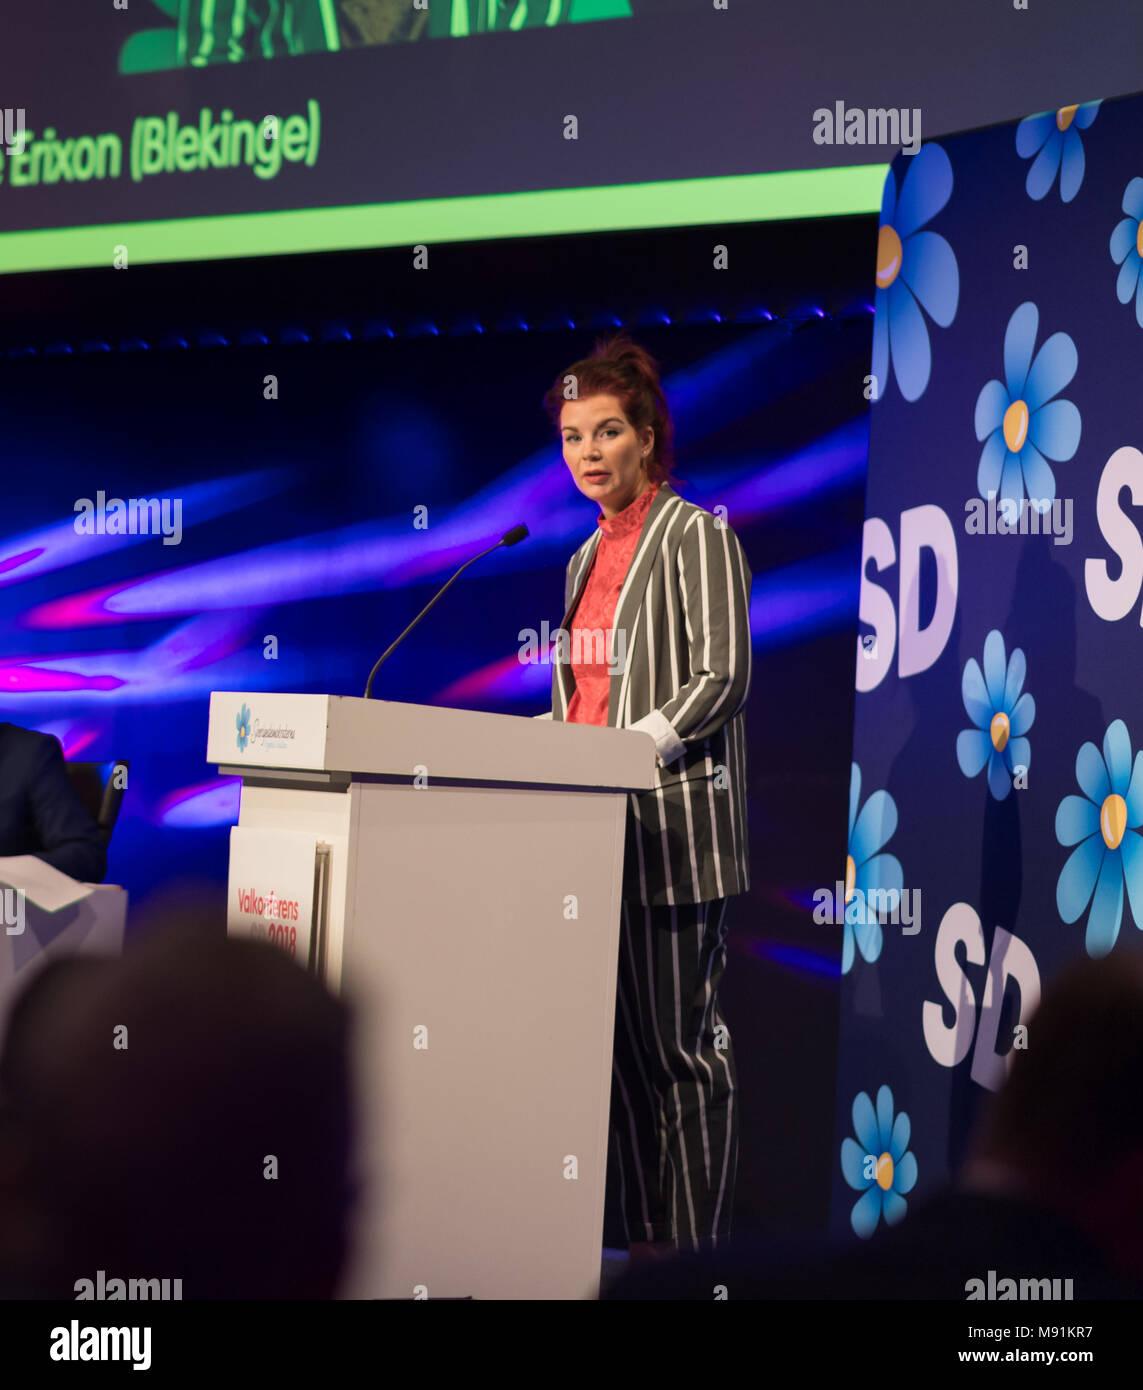 Stockholm, Sweden, March 17, 2018. Sweden Democrats (SD) Election Conference 2018. Louise Erixon, Group Leader Solvesborg. - Stock Image